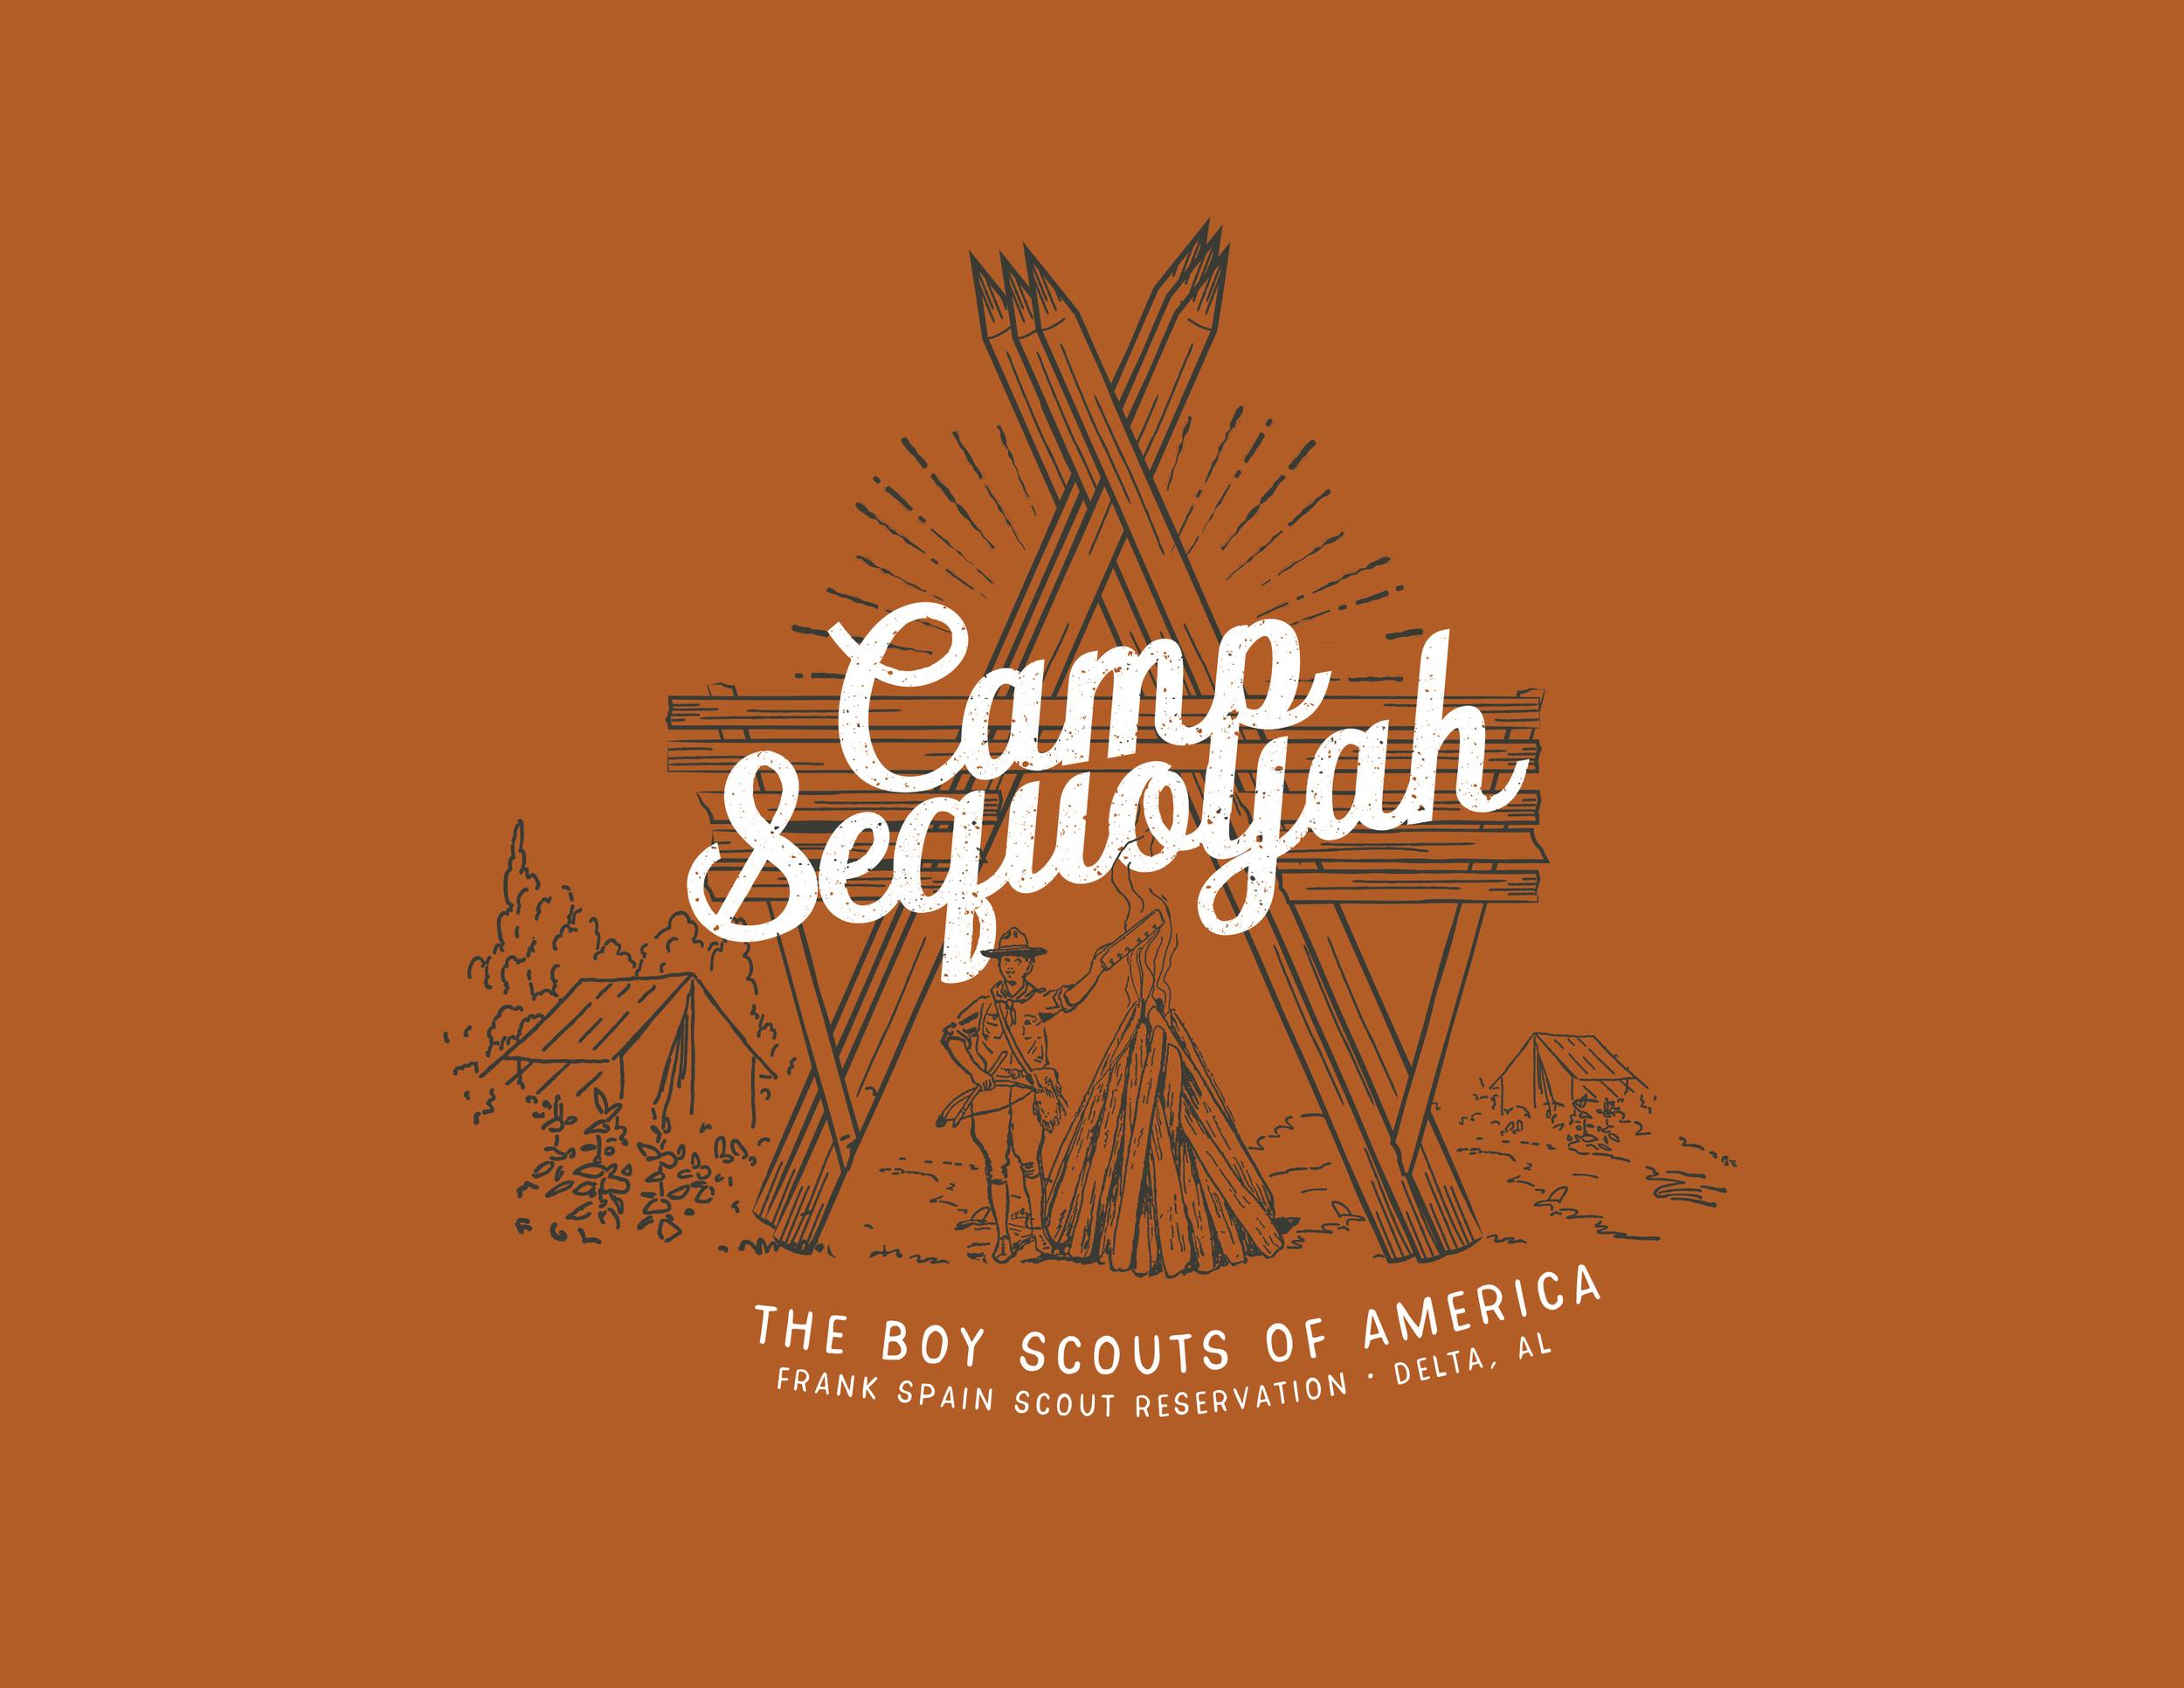 CampSequoyah_Tshirts-02.jpg